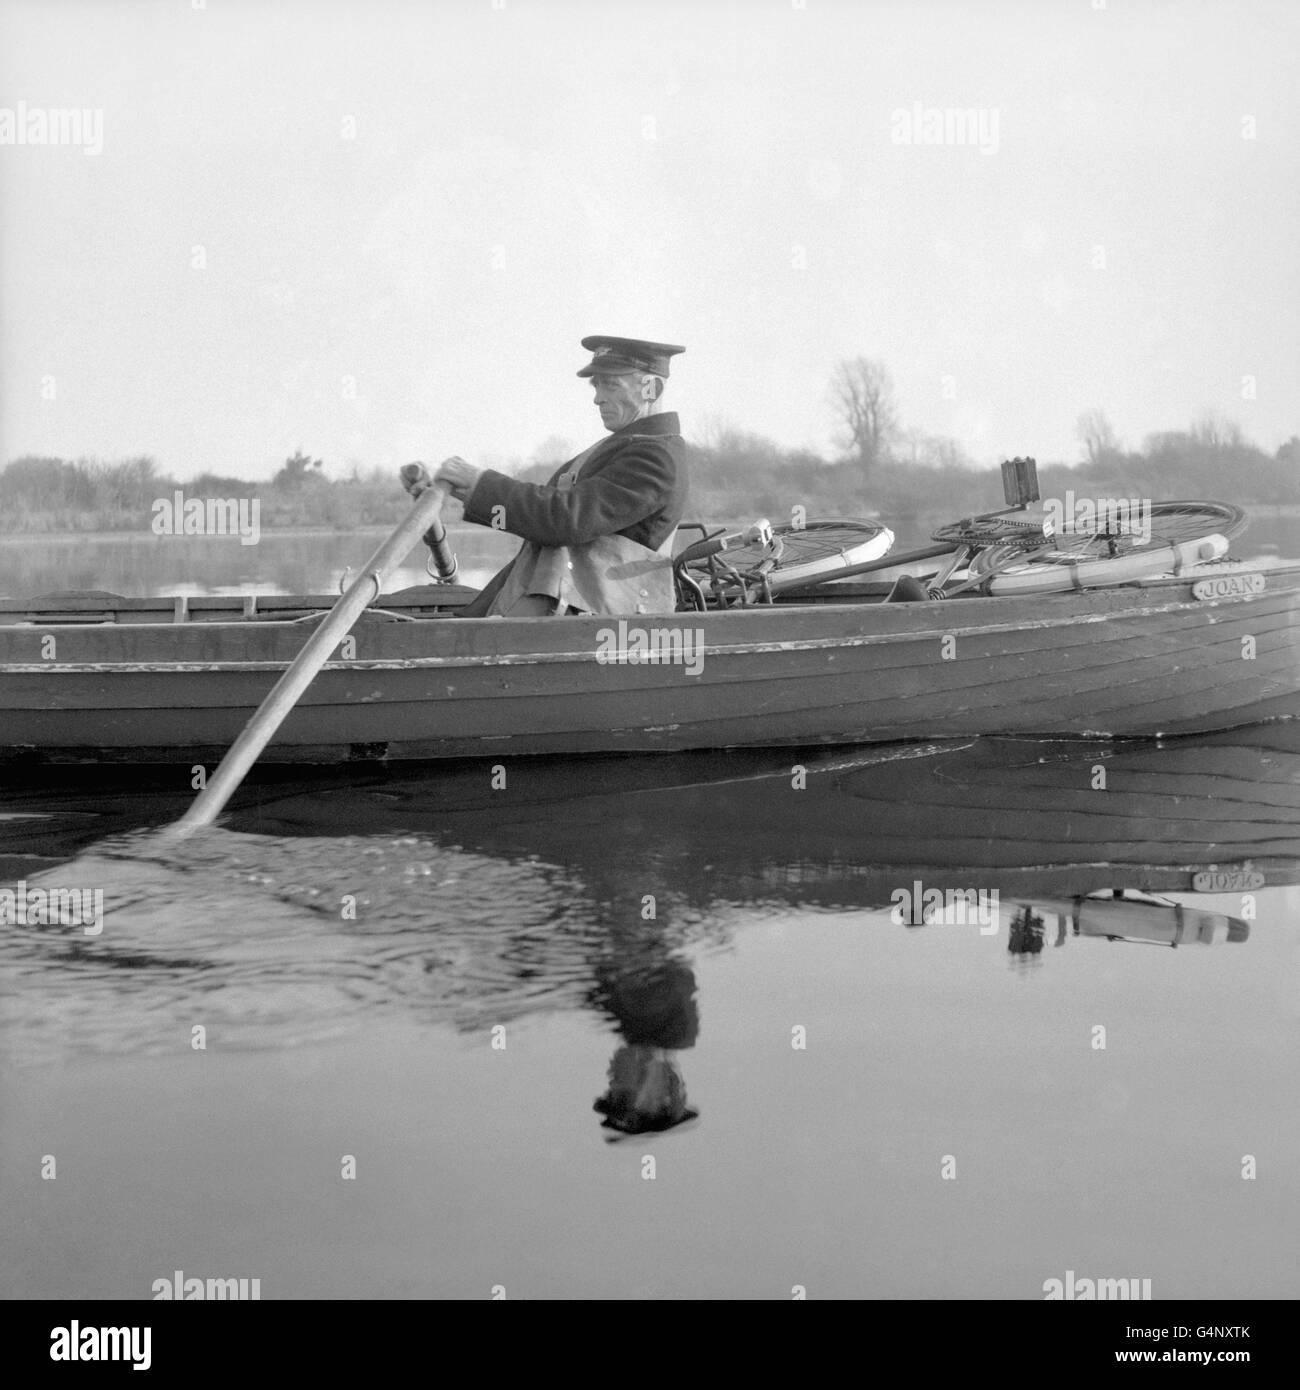 Northern Irish Postal Service - Boat Postman - Upper Lough Erne, County Fermanagh - Stock Image